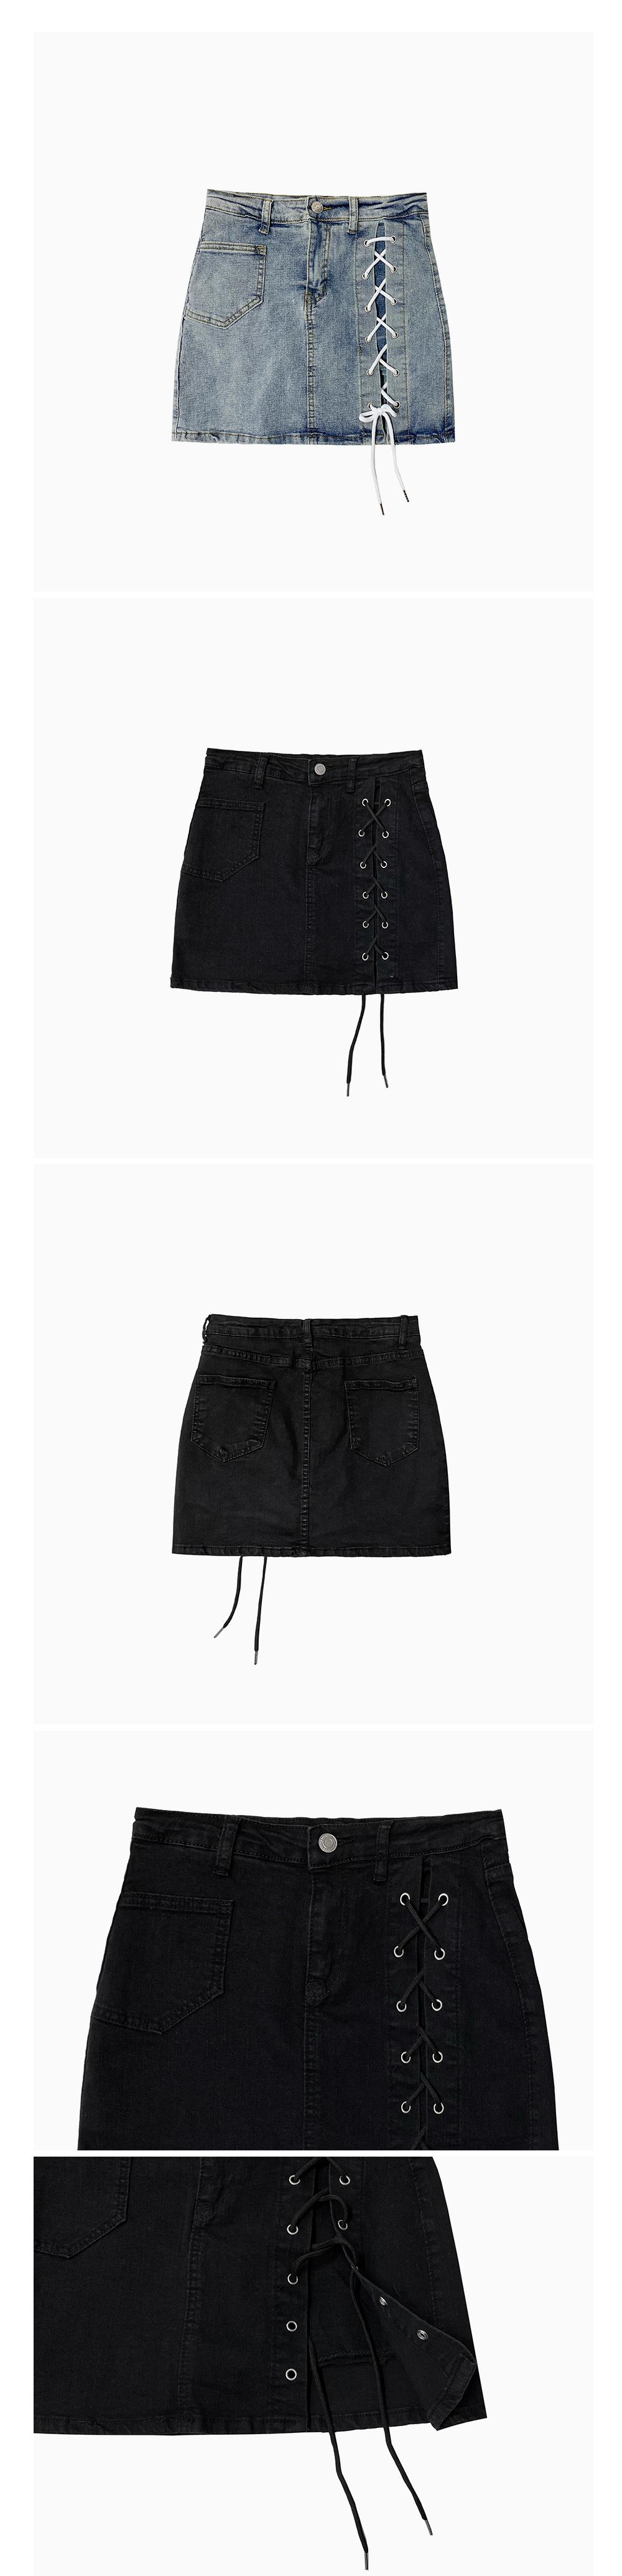 Hako Eyelet Skirt Pants